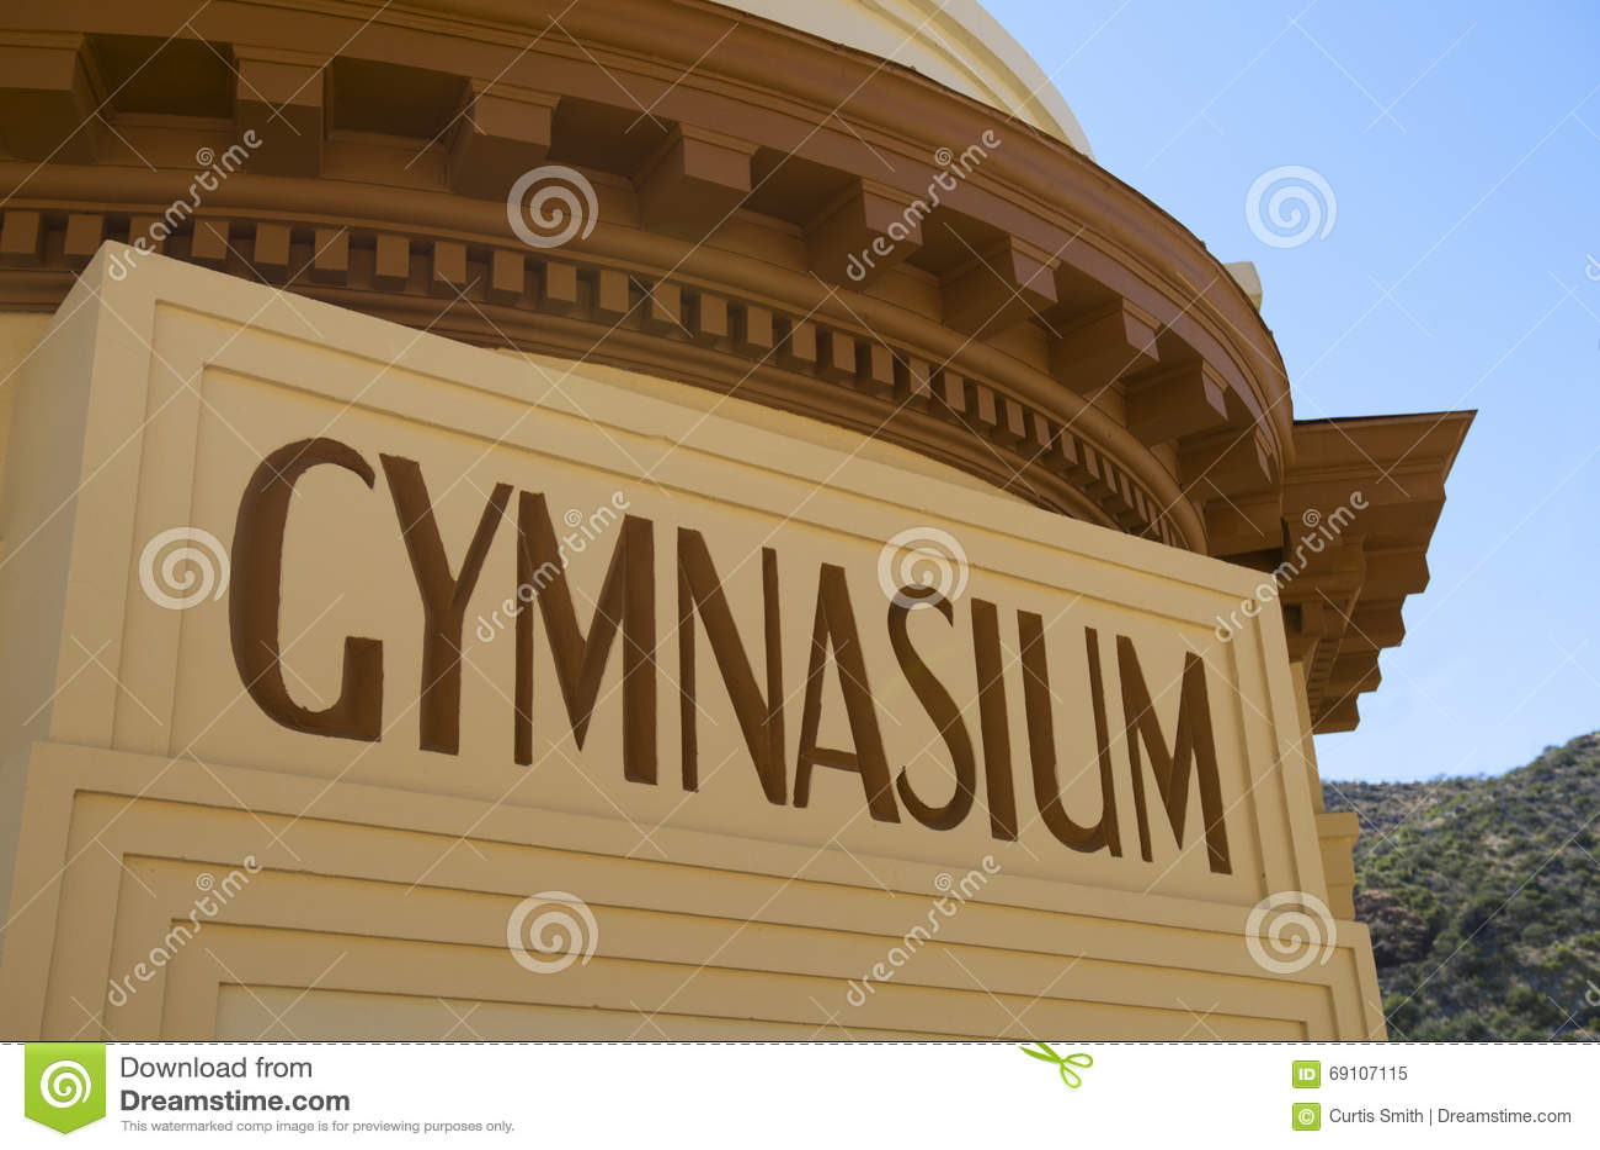 Art deco Gymnasium building marquee sign